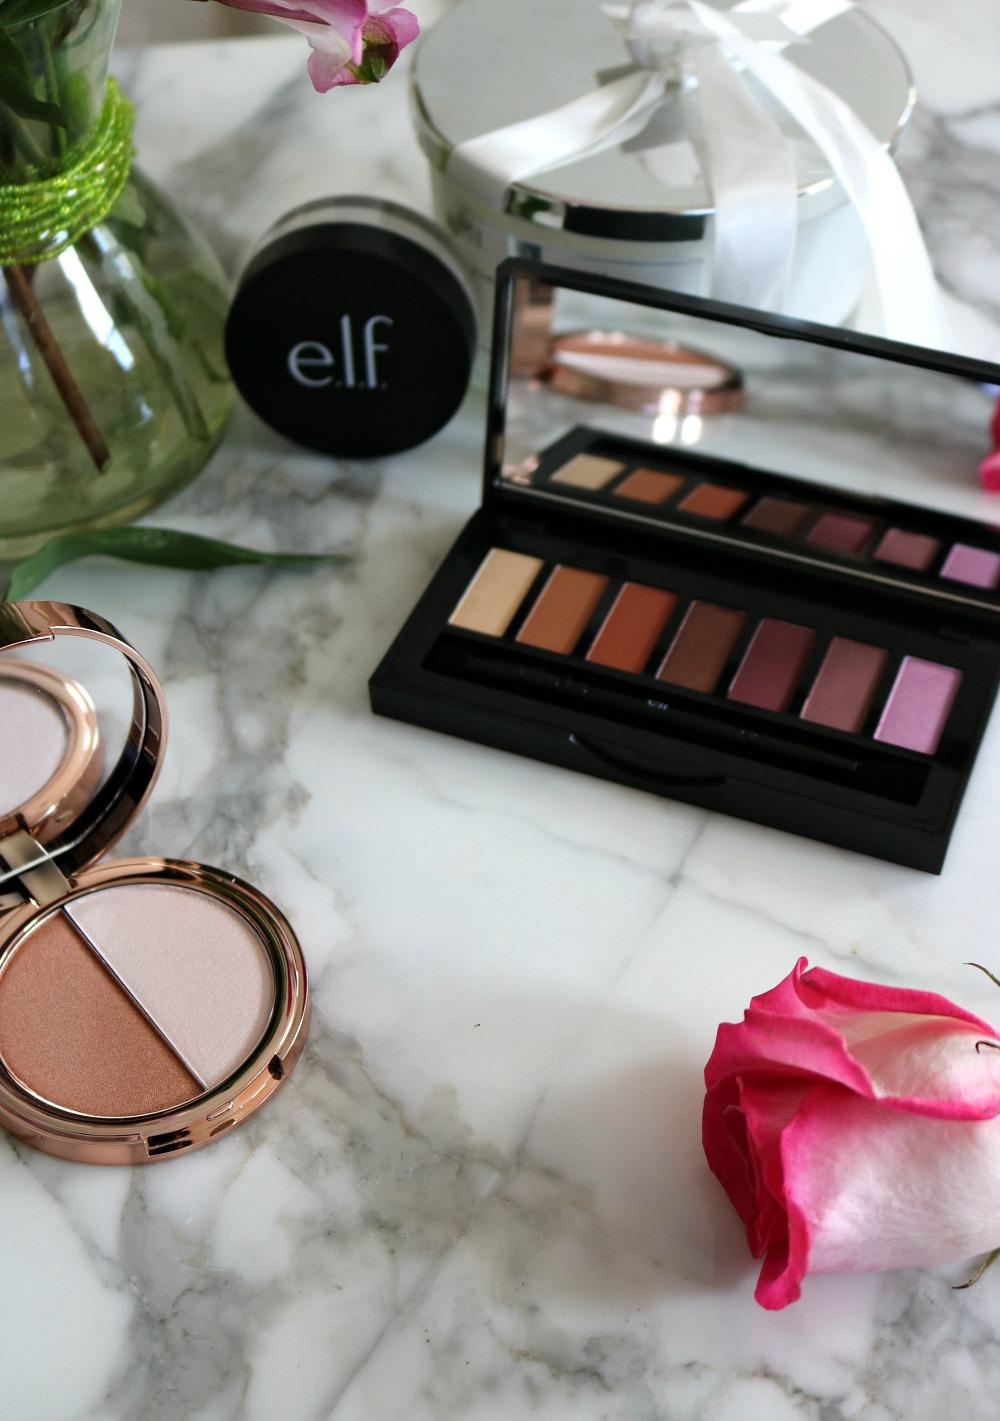 Elf Chromatic Eyeshadow Palette I DreaminLace.com #CrueltyFreeBeauty #SpringMakeup